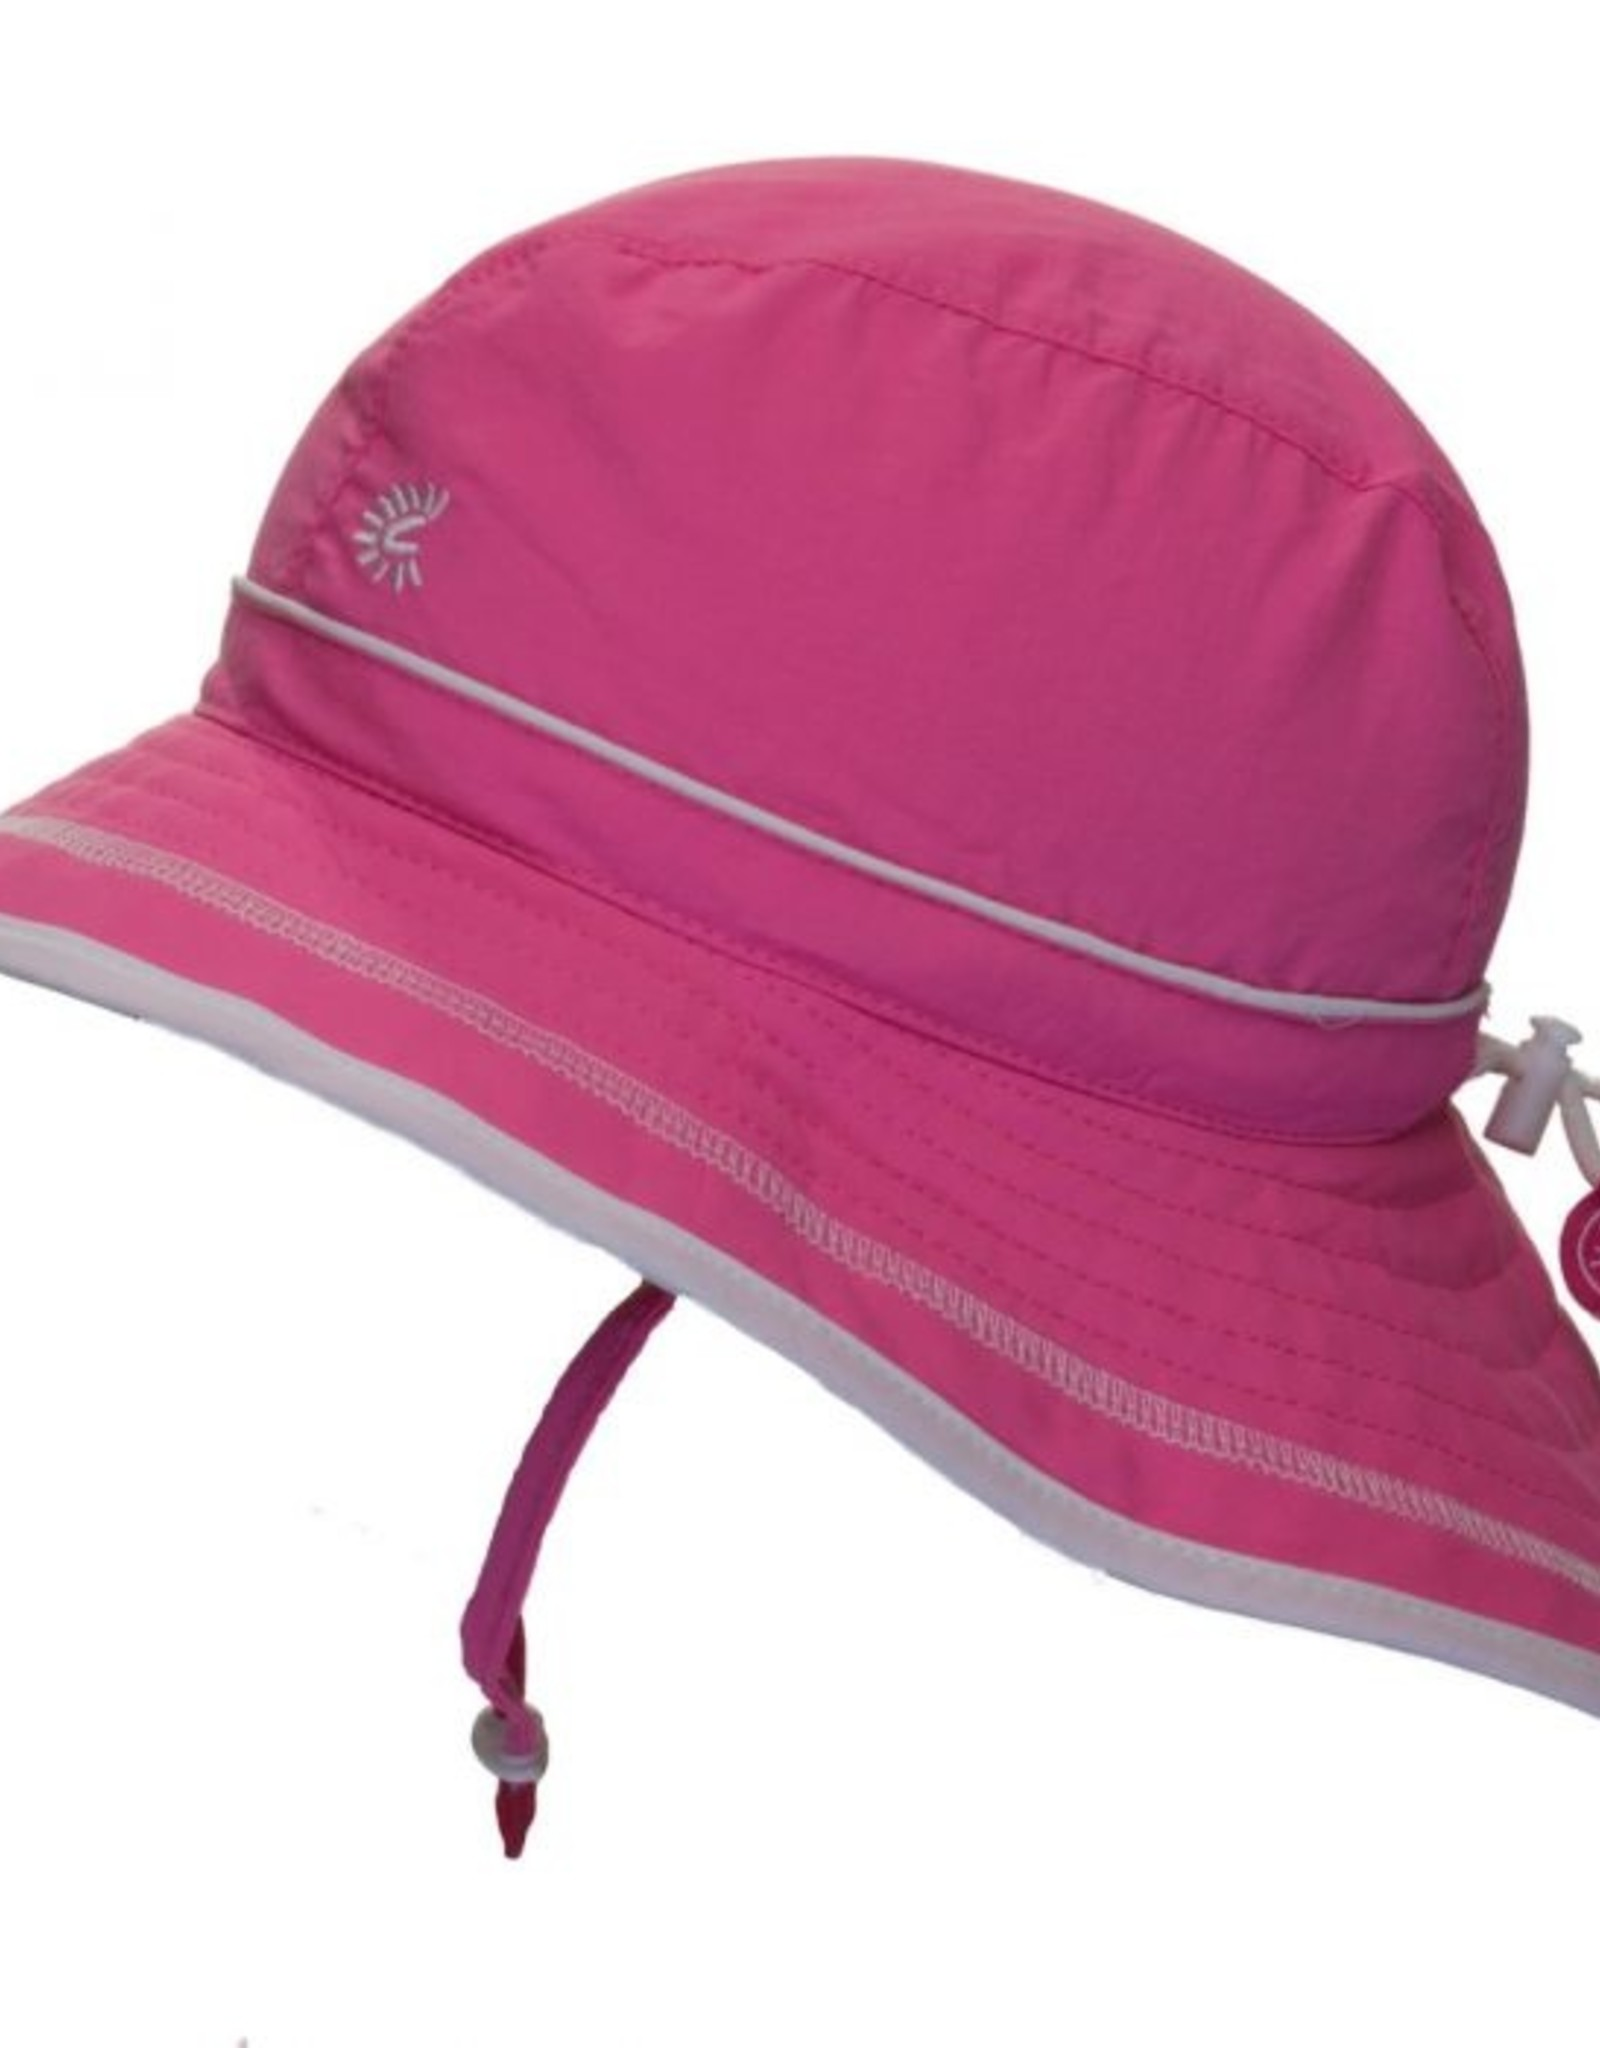 CaliKids Quik Dry UPF 50+ Sun Hat - Pink